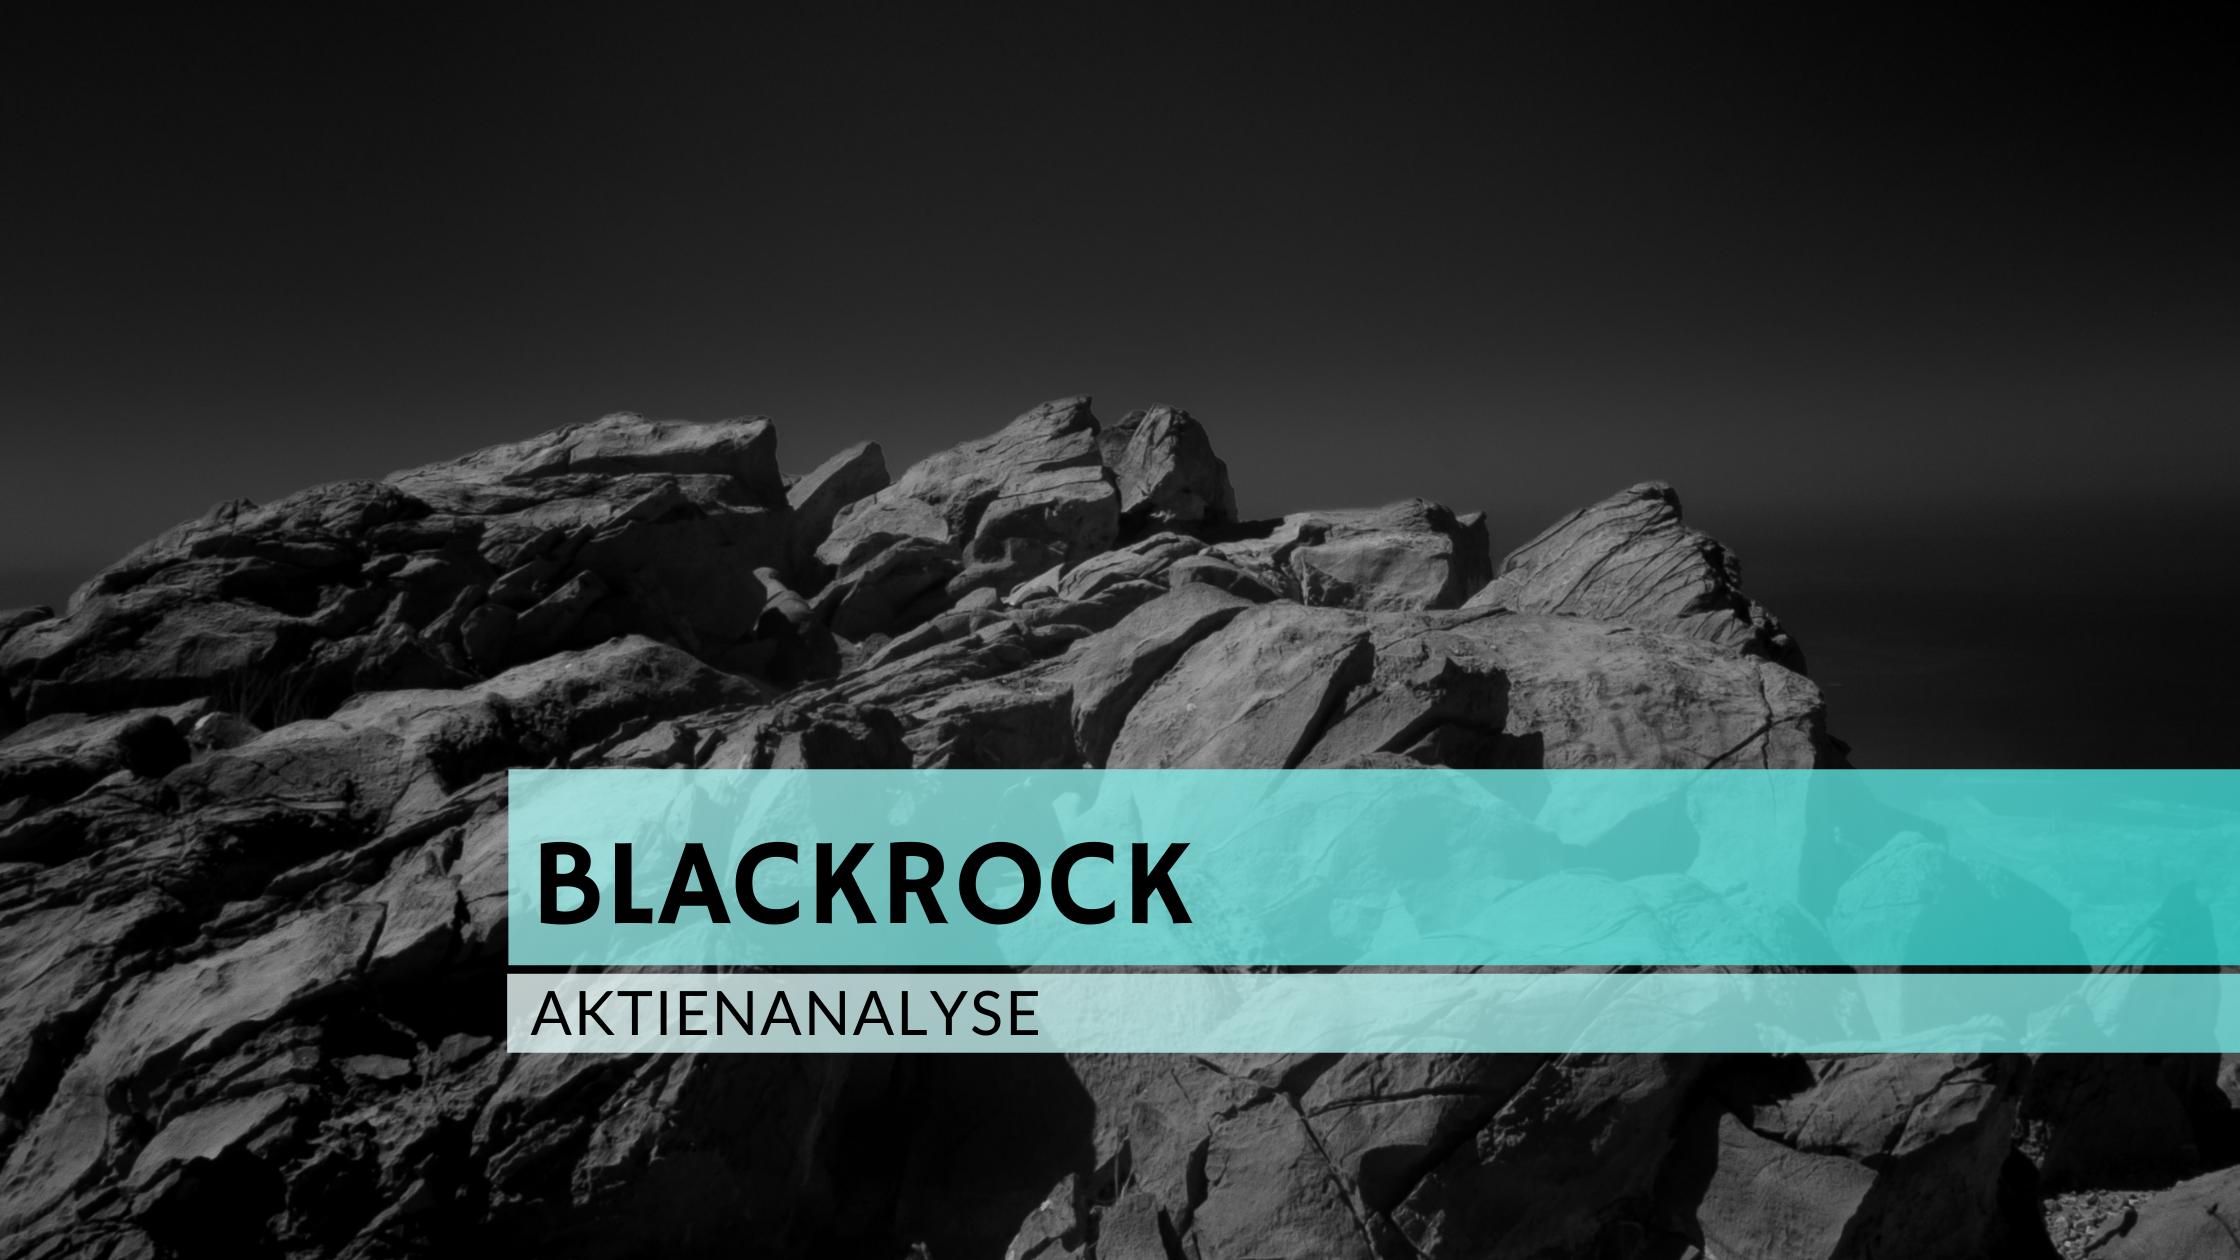 BlackRock Aktienanalyse